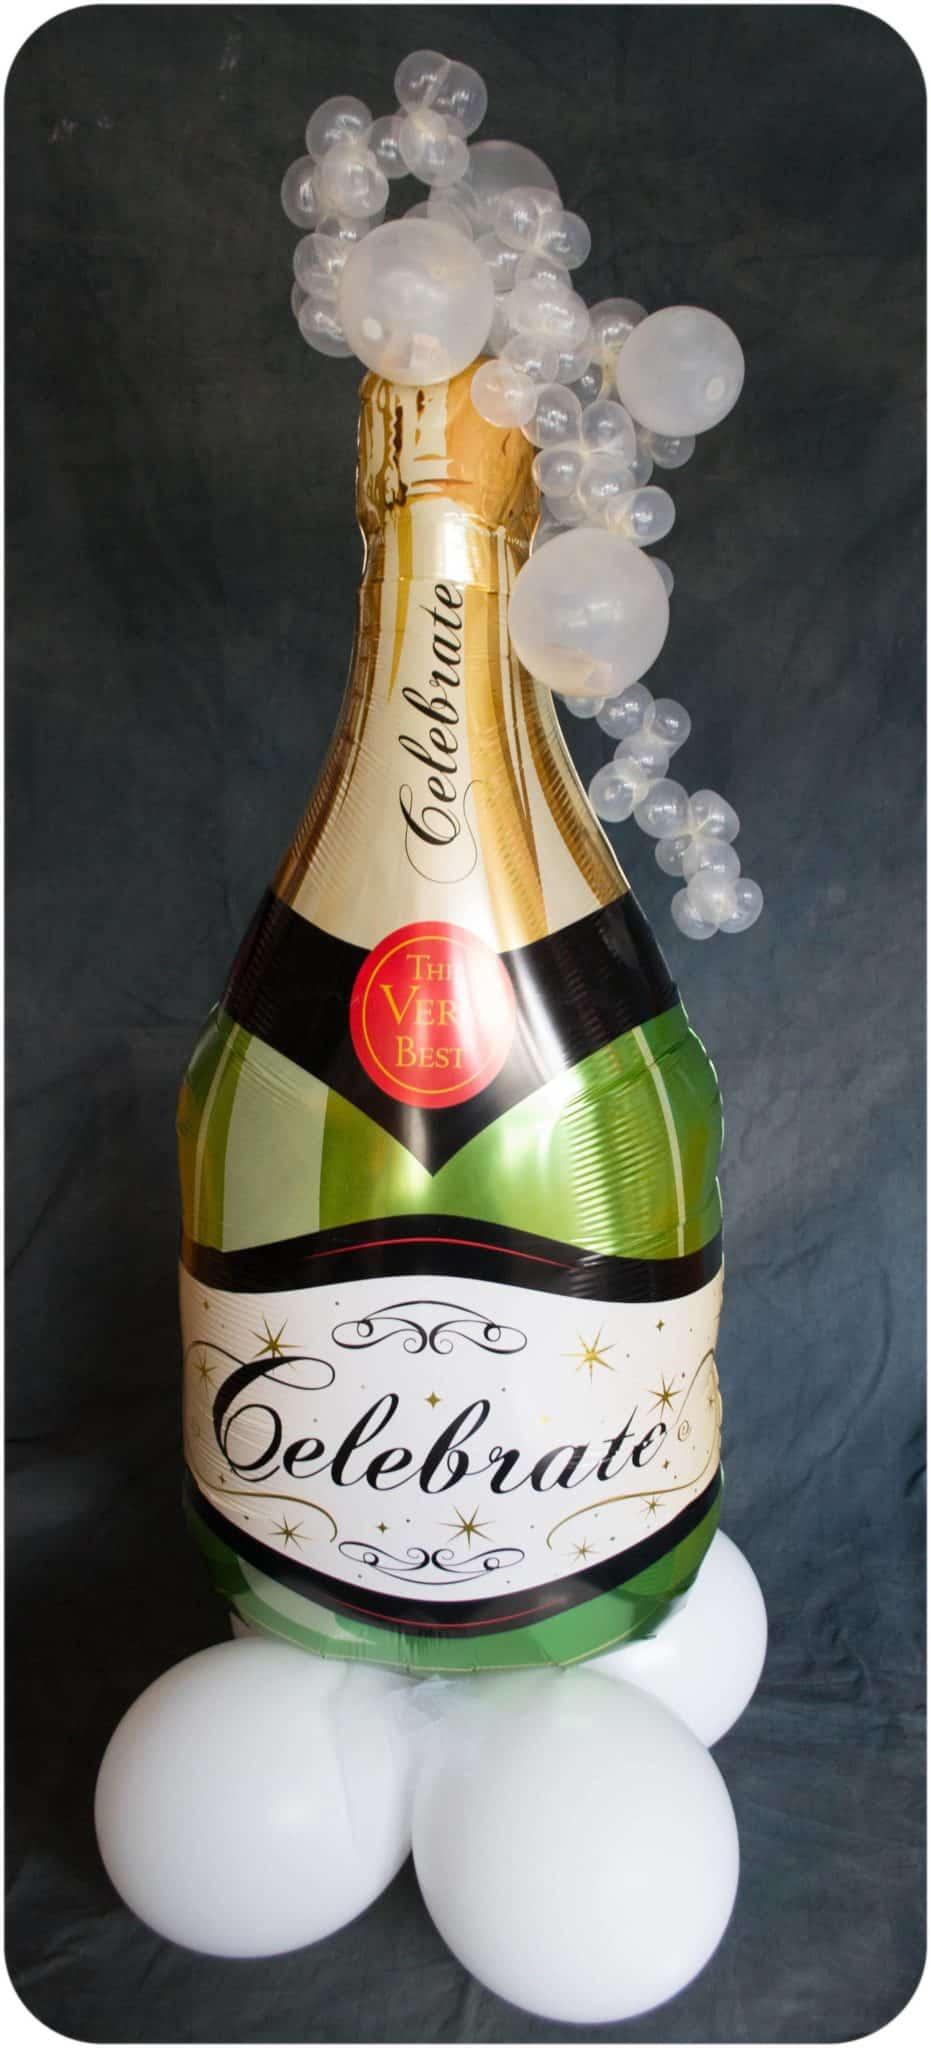 XXL Folienballon Champagner 35 x 91 cm Riesenballon Sektflasche Dekoballon